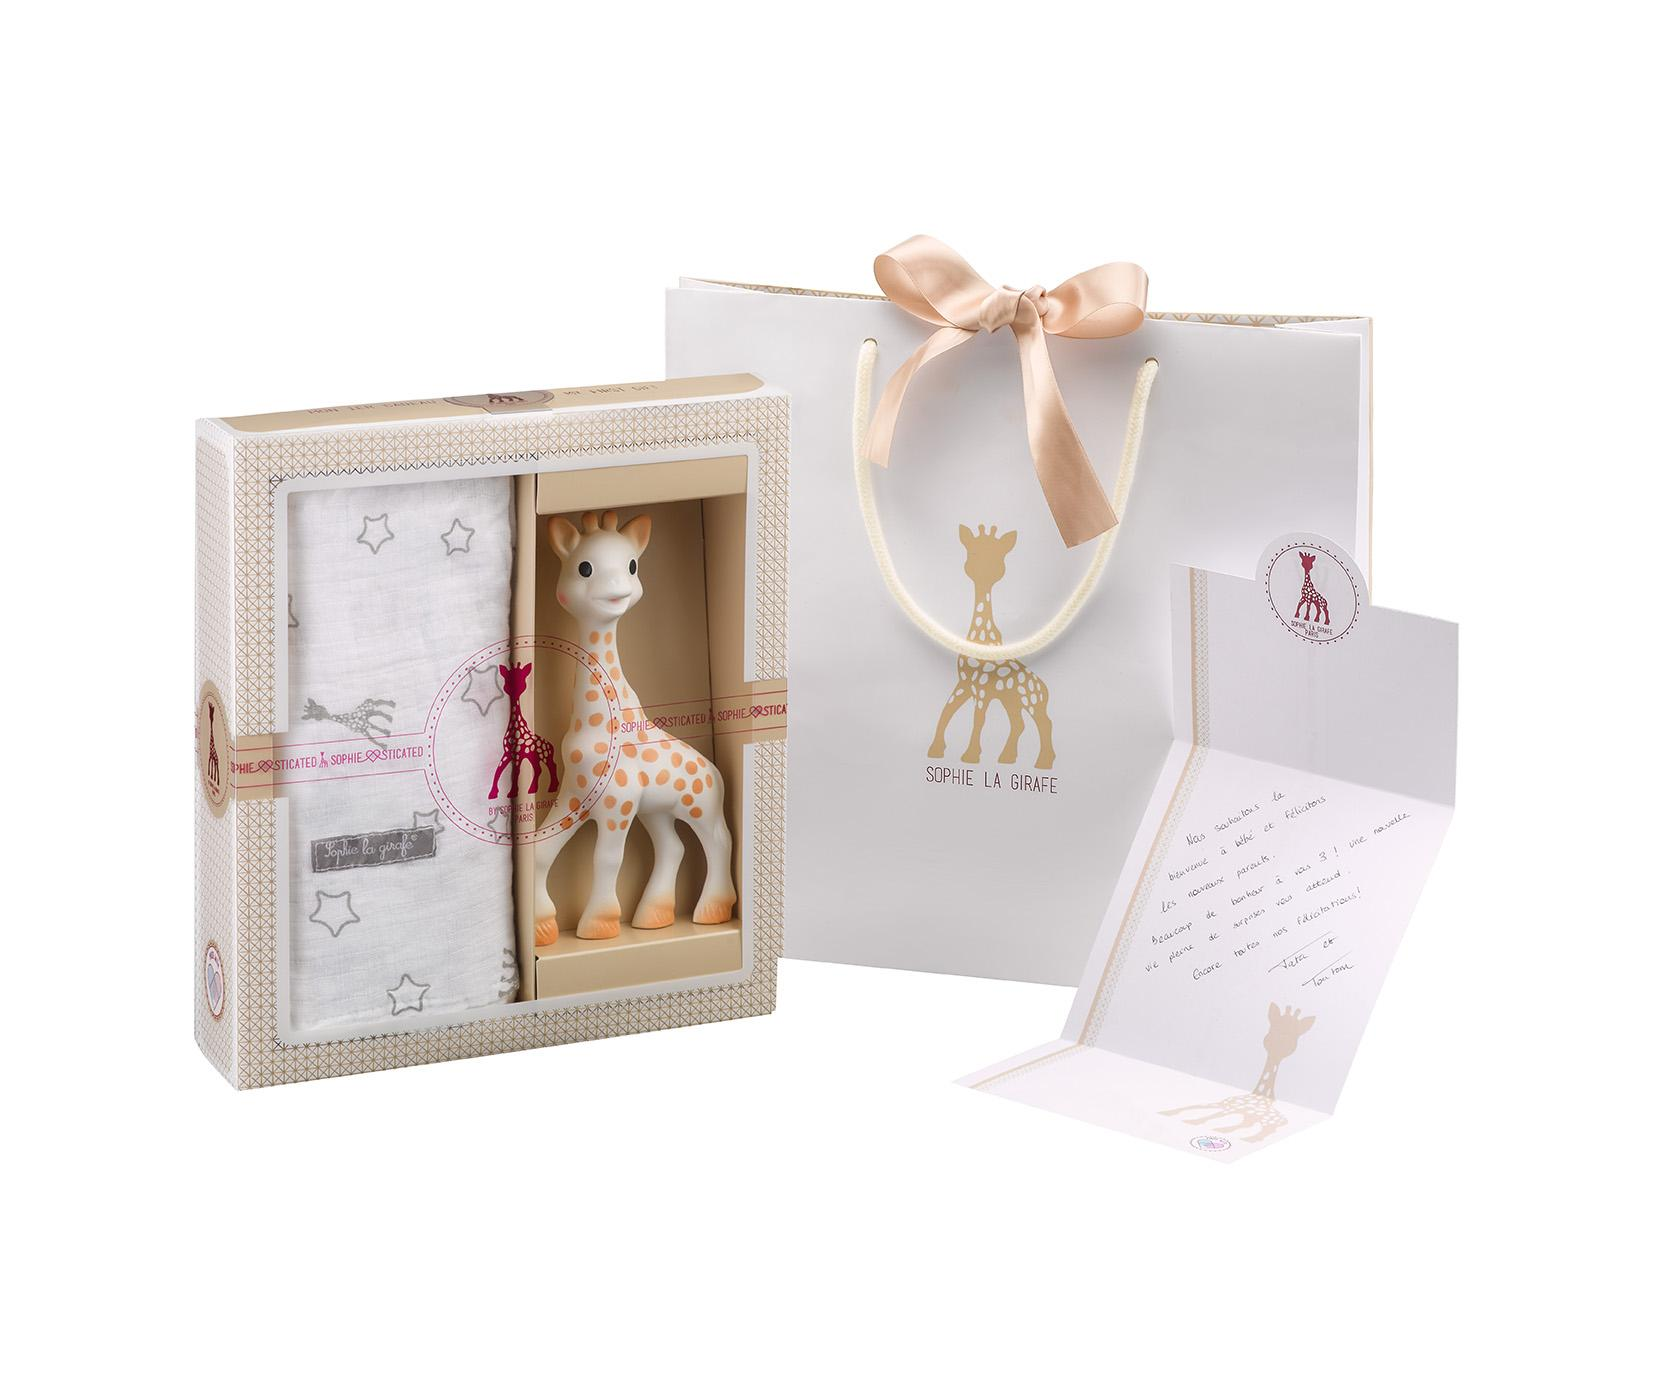 Coffret Sophiesticated - Sophie la girafe + Lange